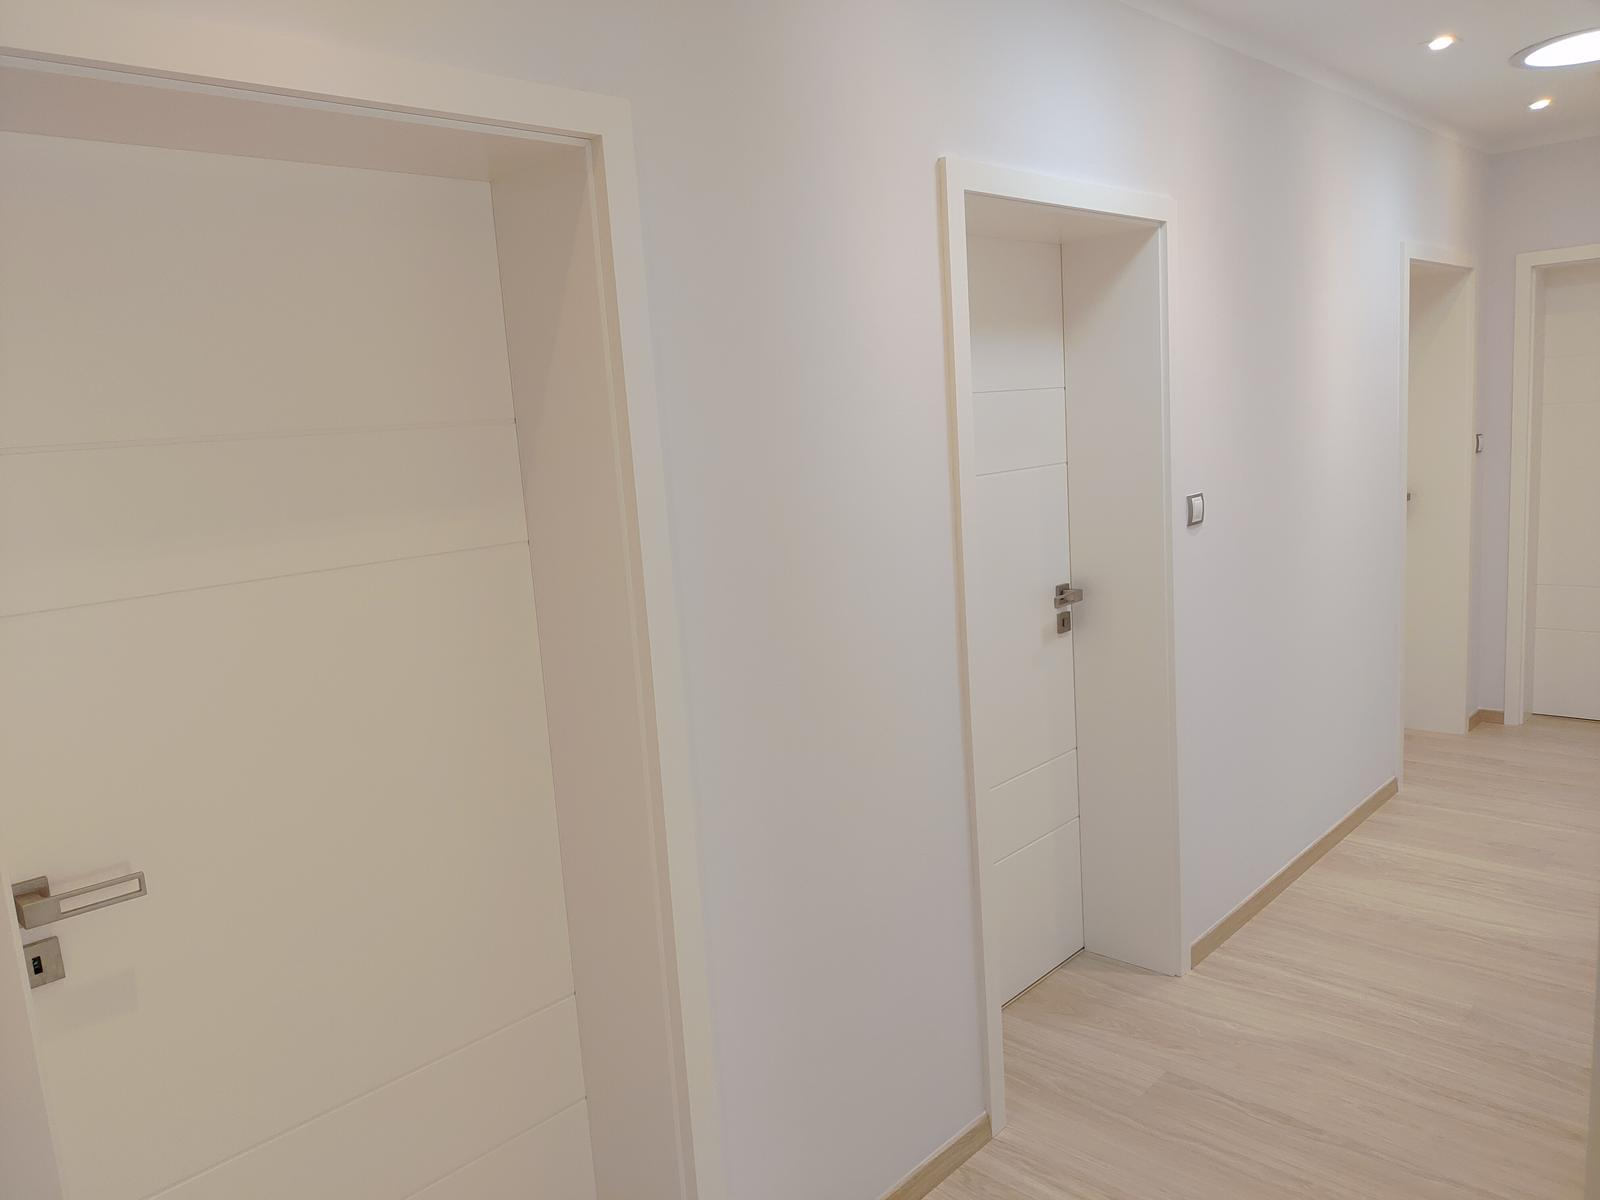 Bile matne dvere Prüm... - Obrázek č. 1